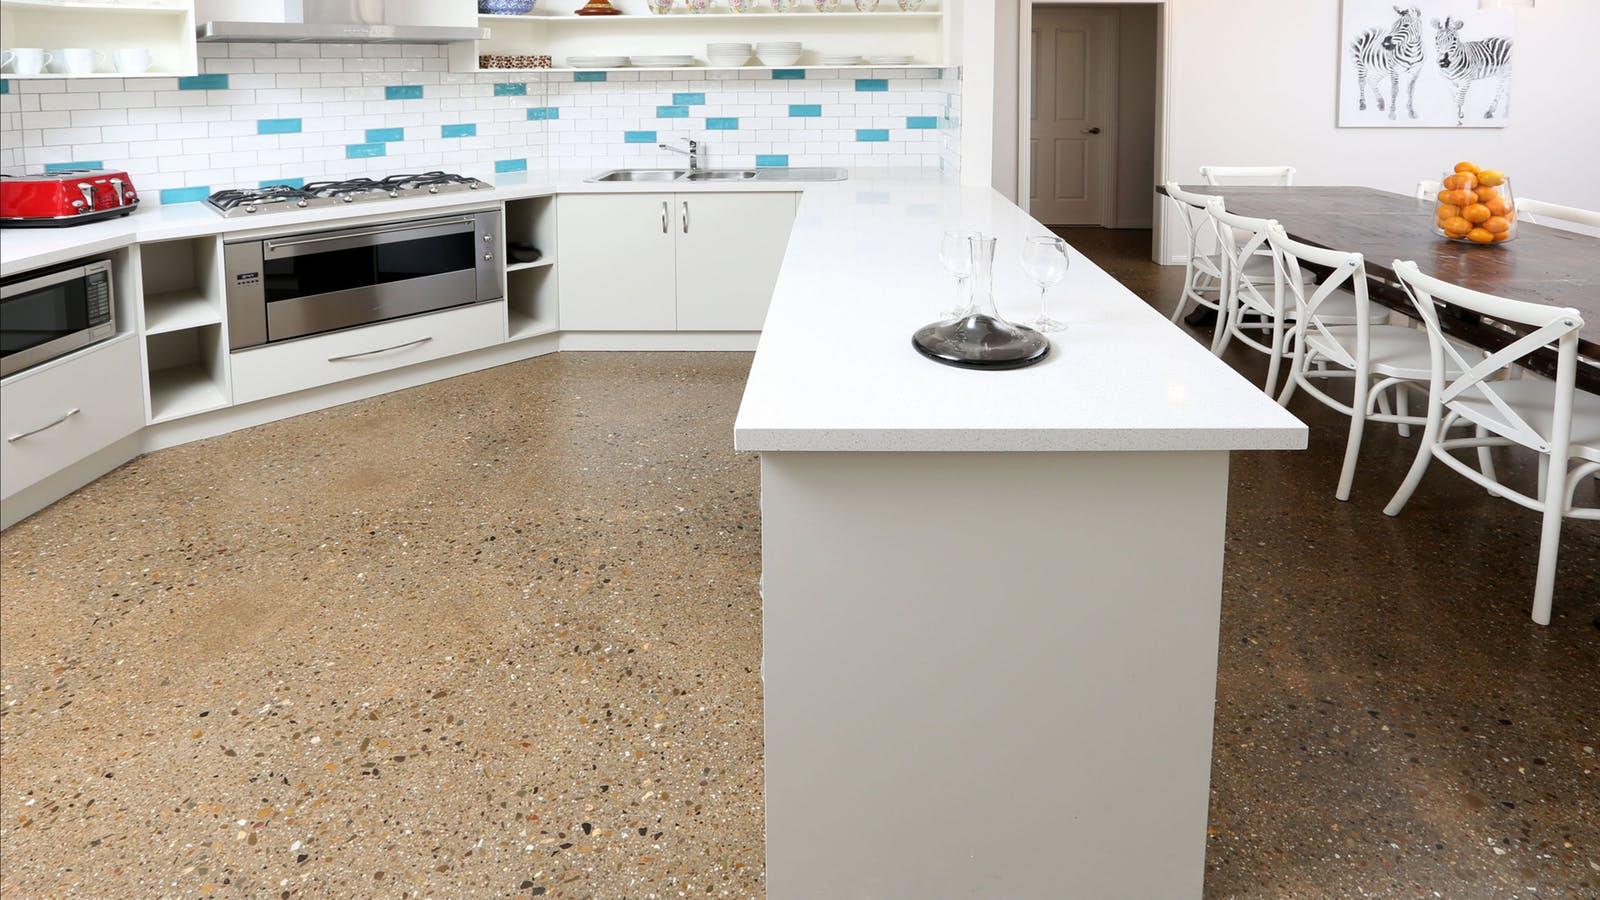 New Miele/Smeg kitchen. Everything provided